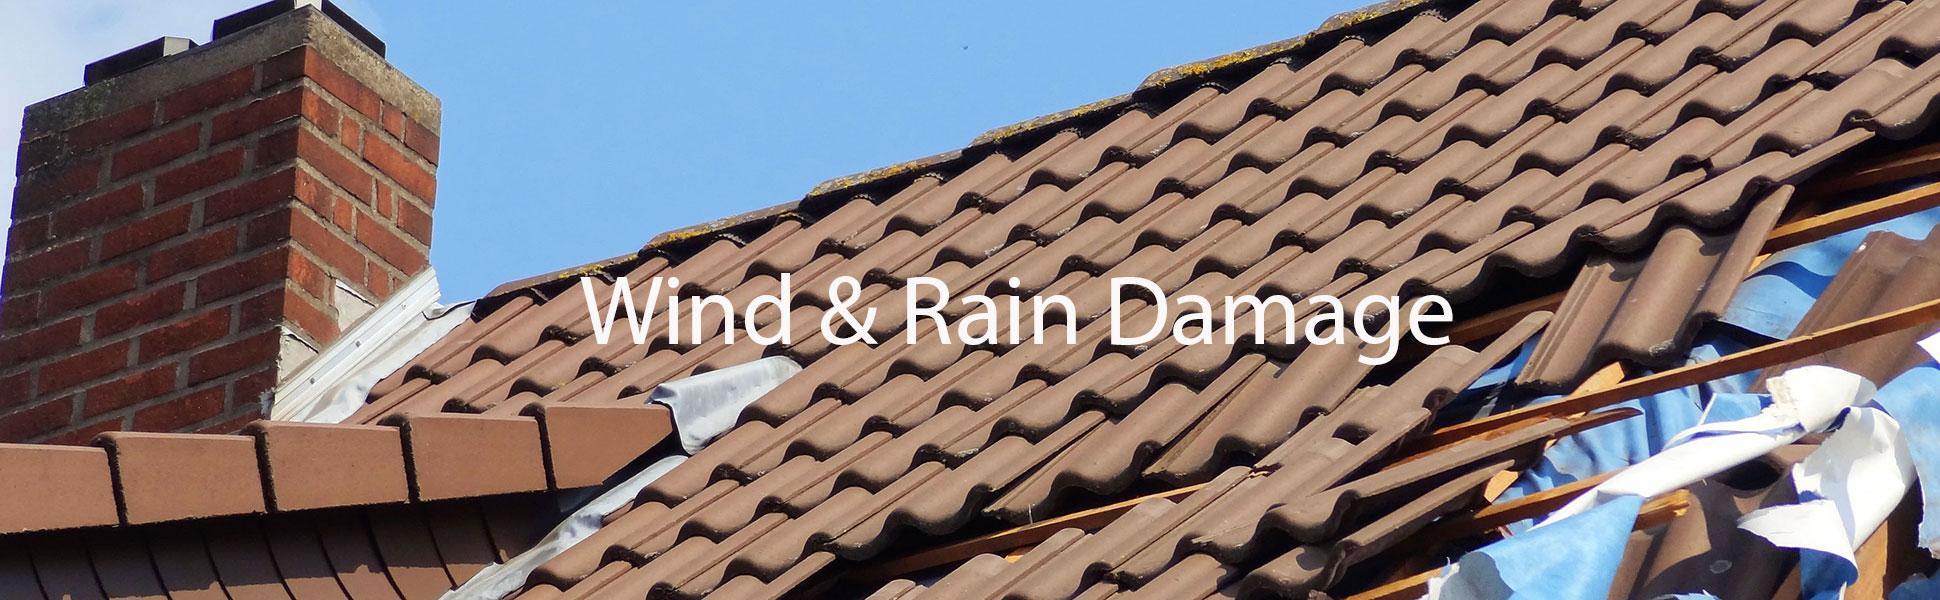 APLC-Wind-Rain-Insurance-Claims-Wehandleinsuranceclaims.com